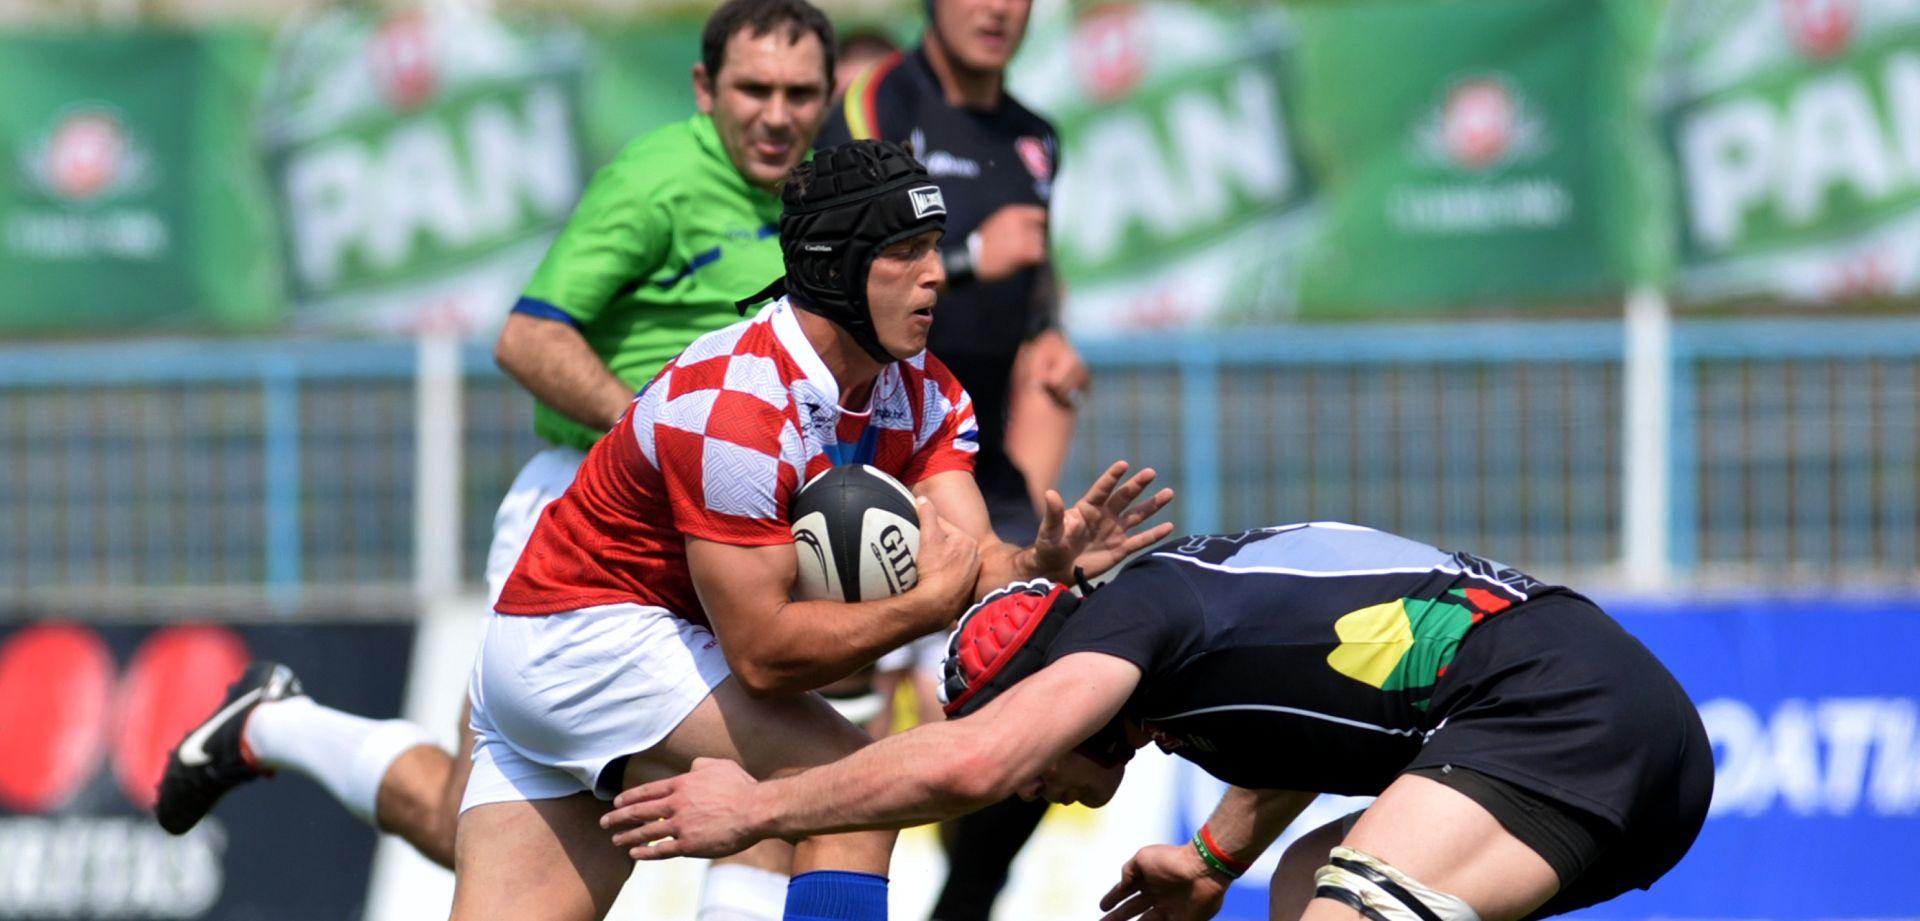 SP RAGBI: Australija – Škotska i JAR – Wales prva dva četvrtfinala